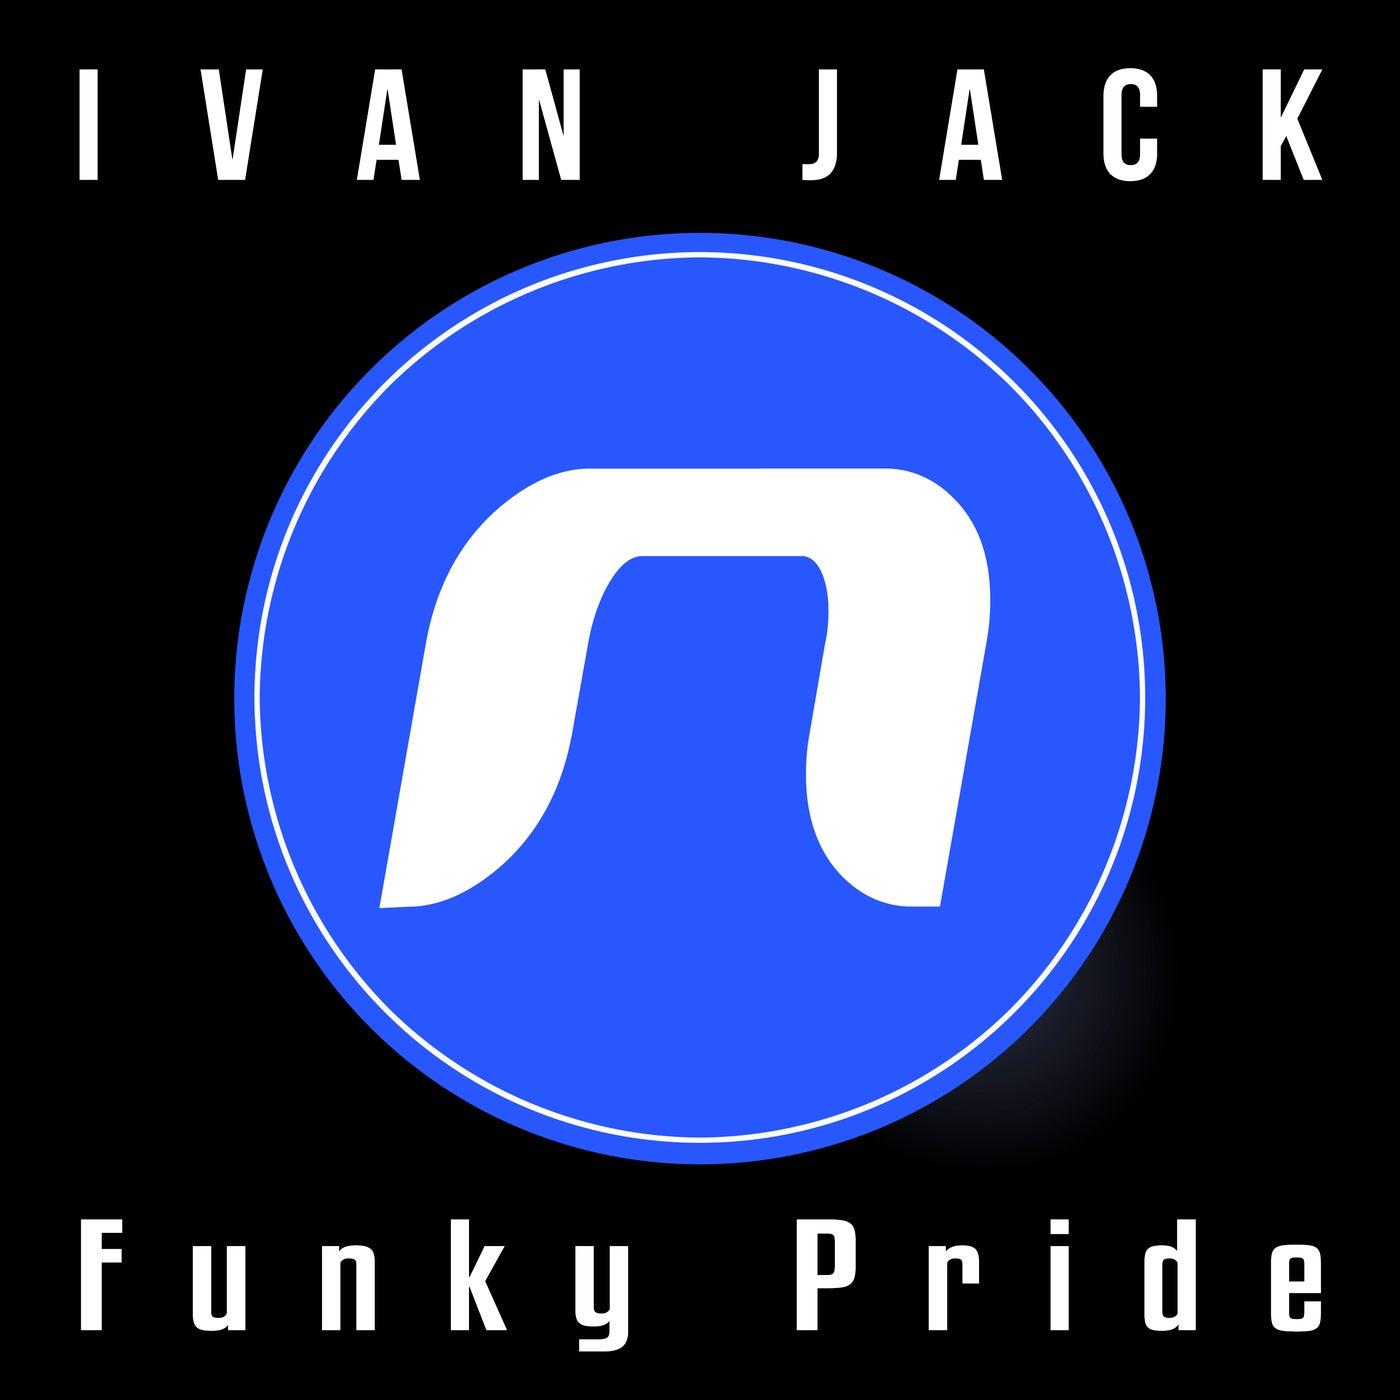 Funky Pride (Original Mix)